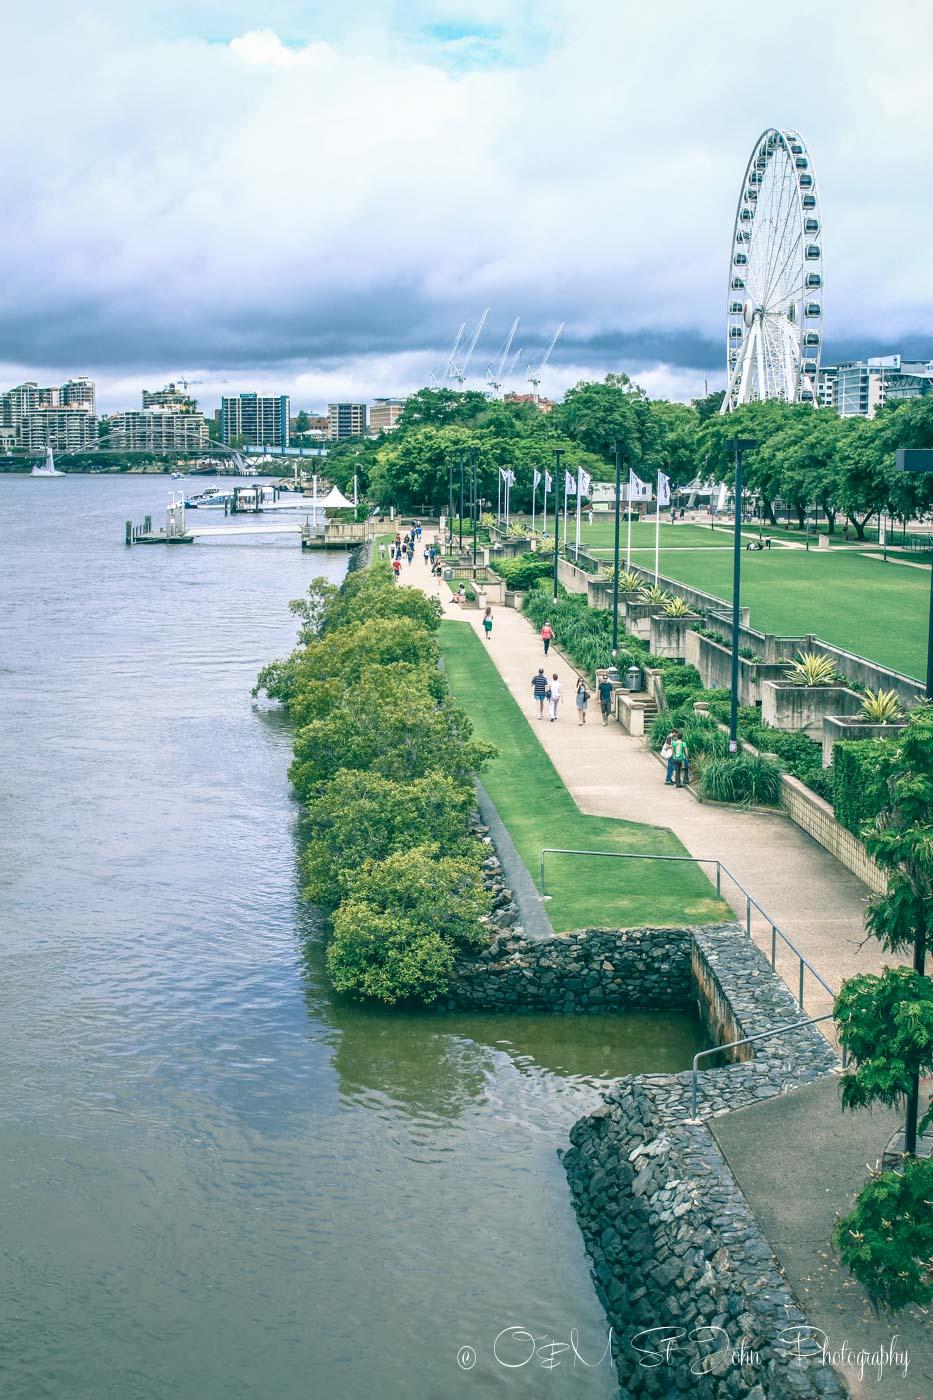 Clem Jones Promenade runs along the river in South Bank. Brisbane